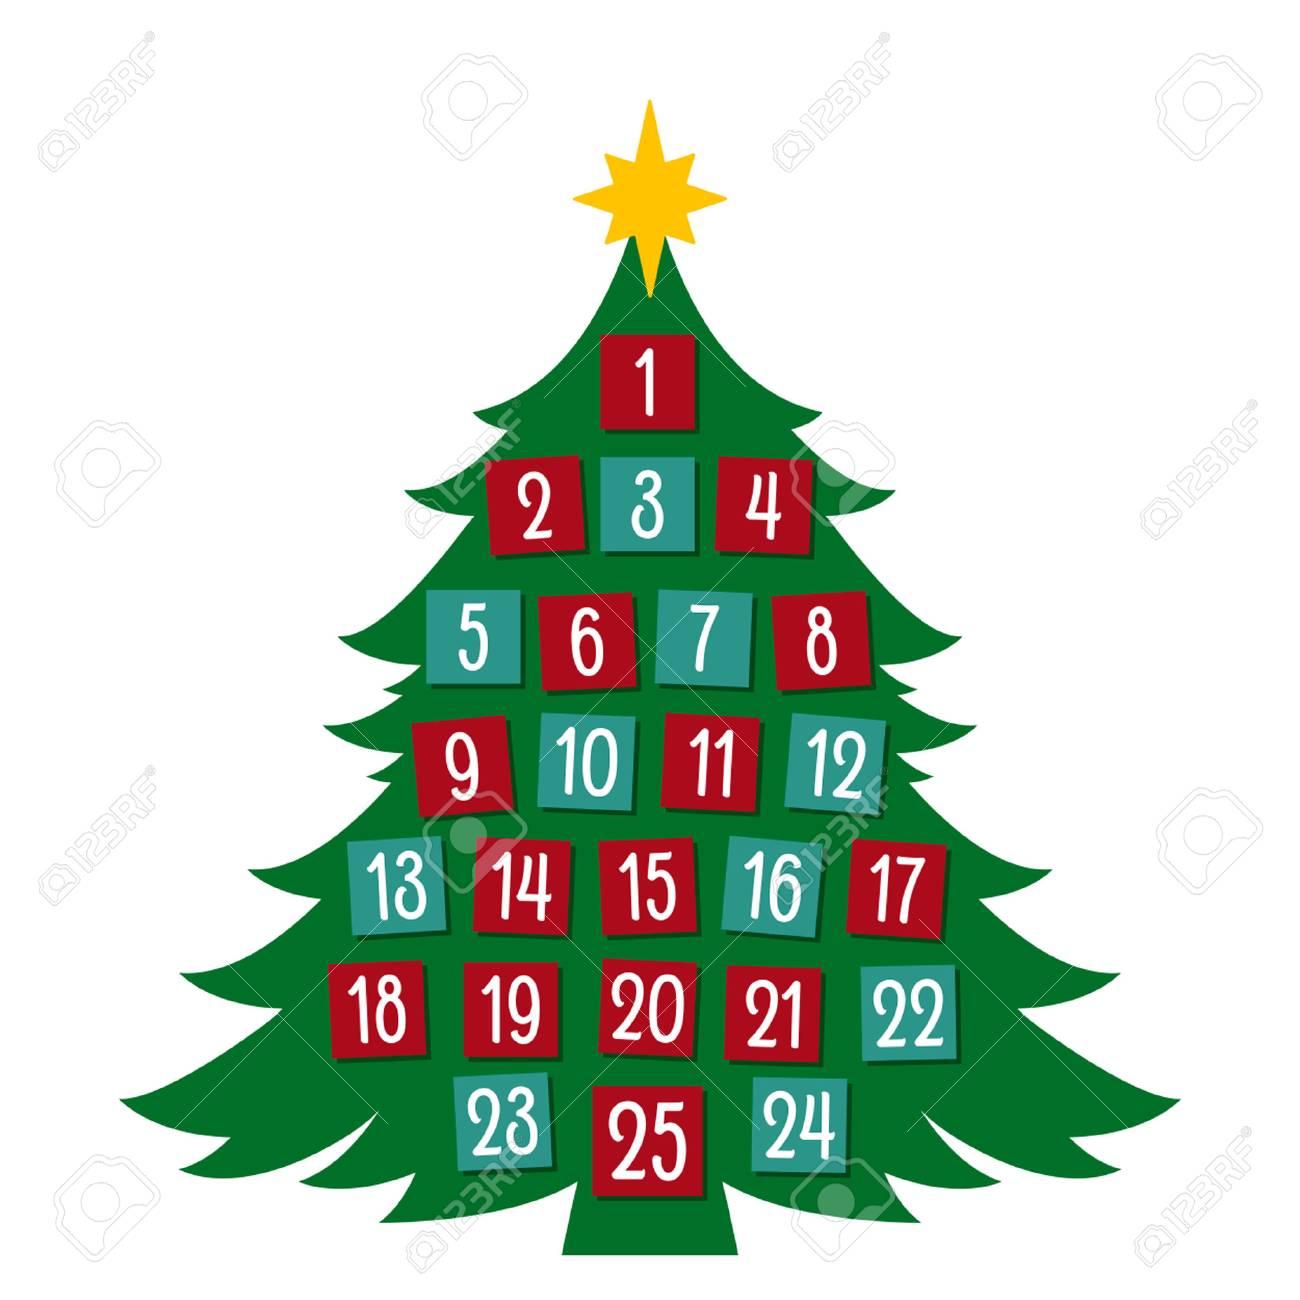 Advent calendar in a flat cartoon style. vector illustration isolated - 88921608